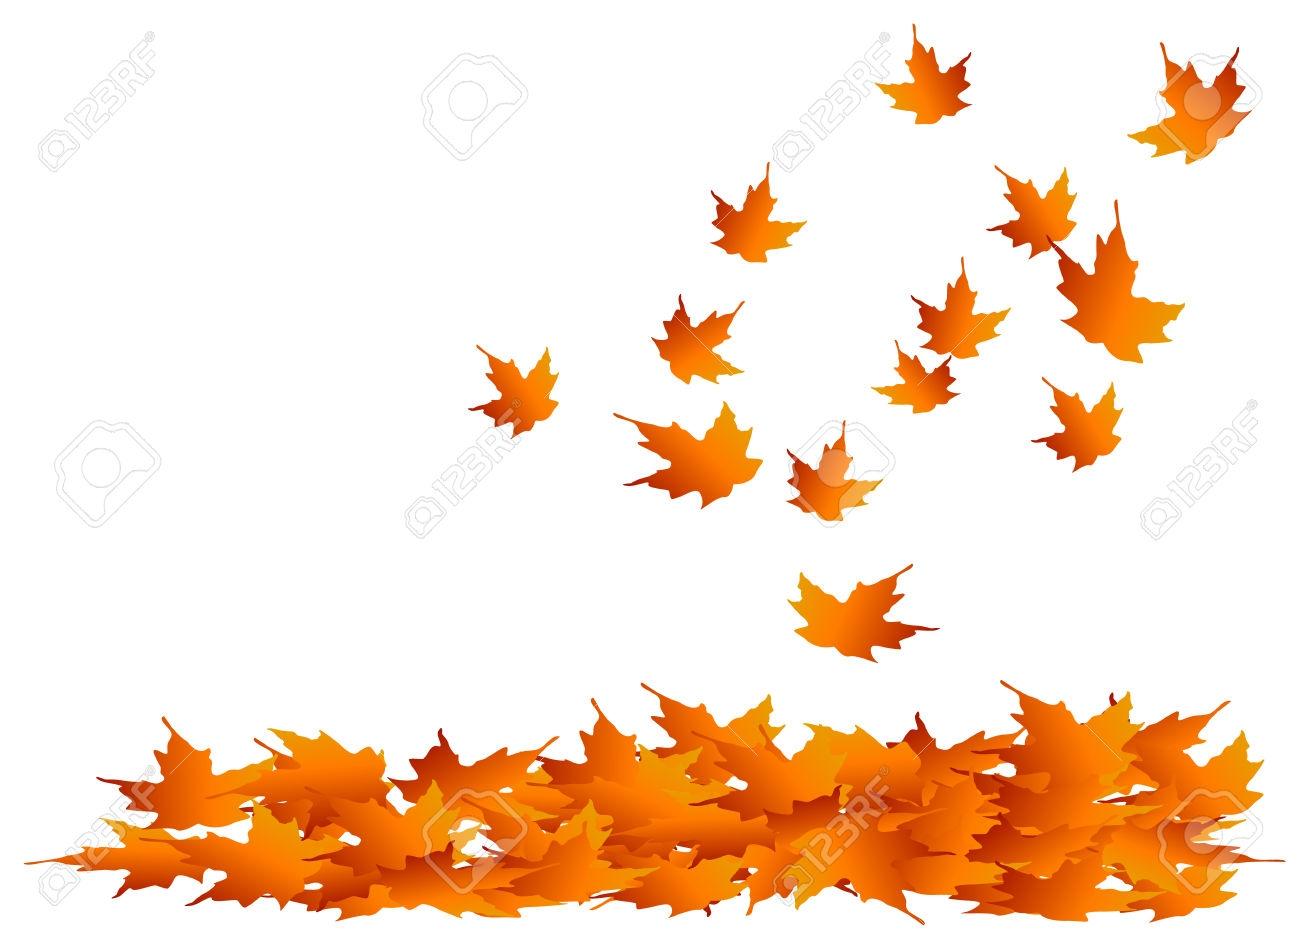 1300x932 Fall Leaf Pile Clipart Amp Fall Leaf Pile Clip Art Images